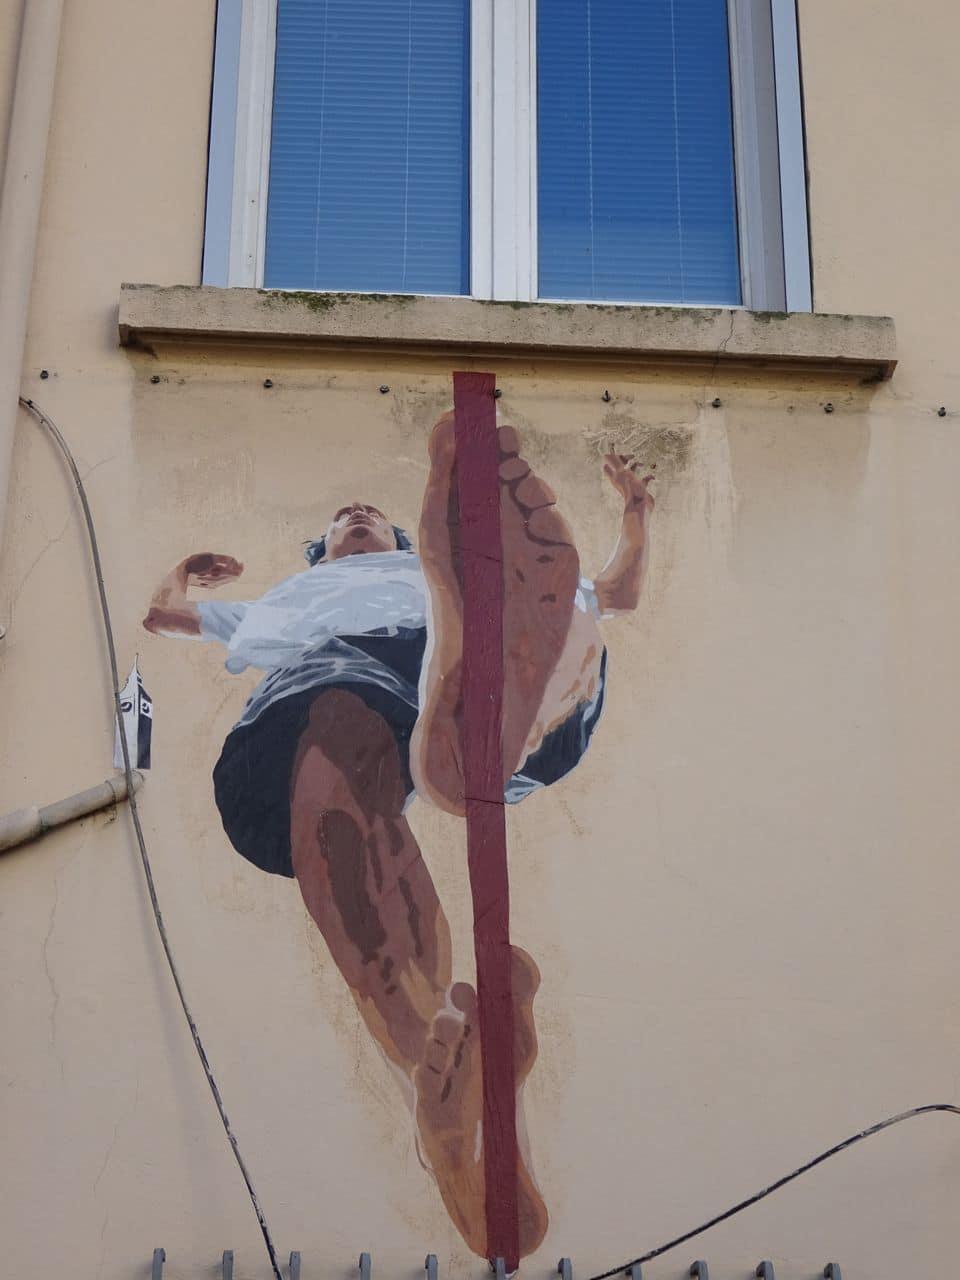 bydav lyon street art